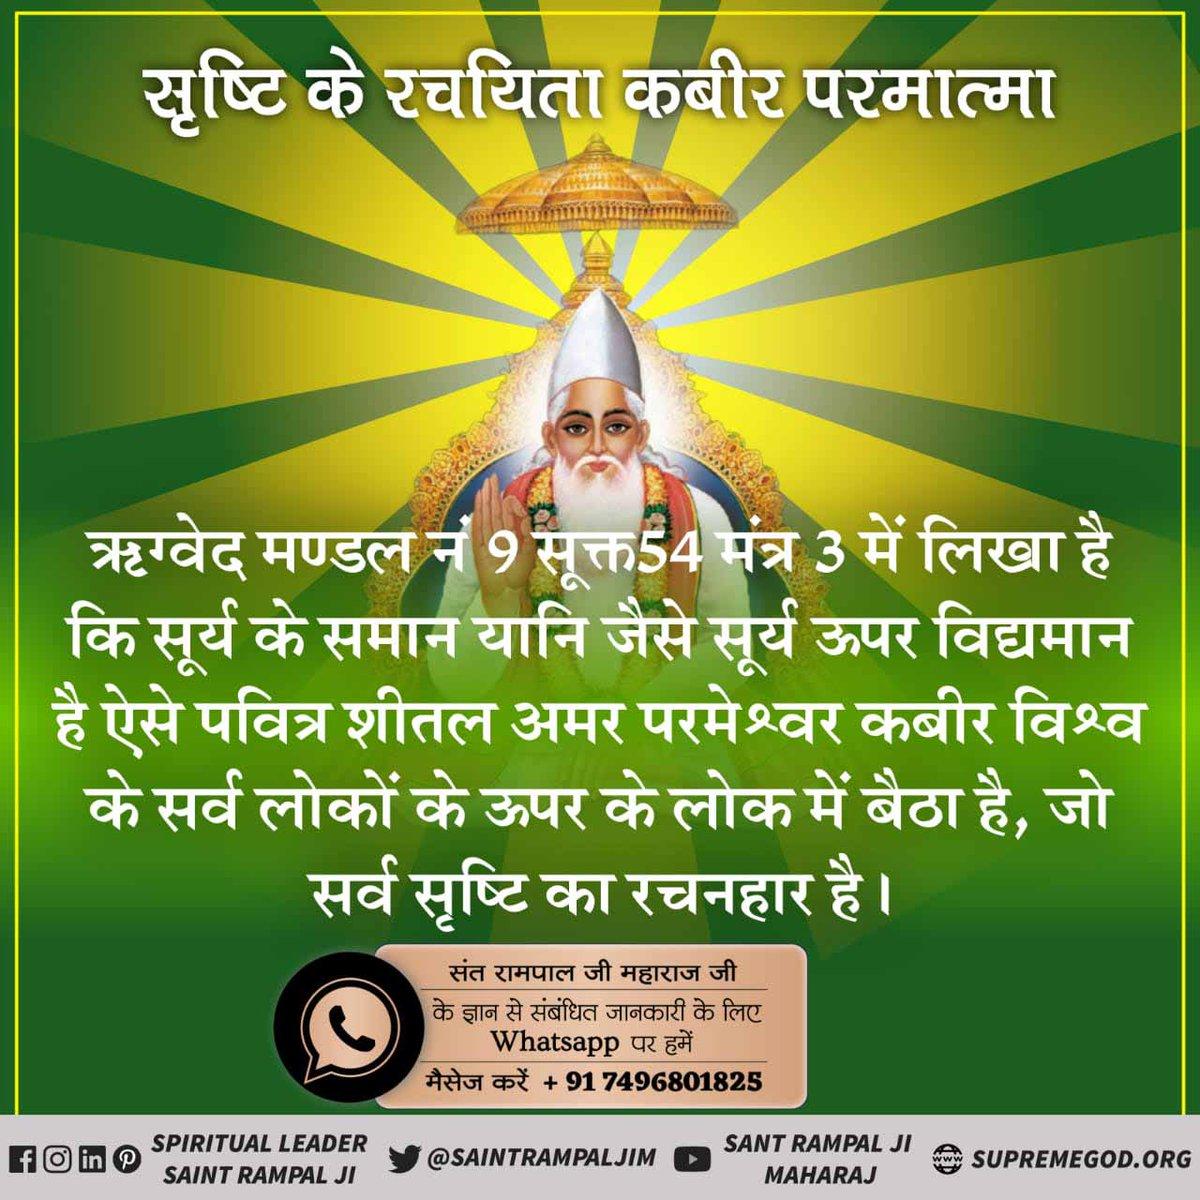 #SupremeGodKabir पूर्ण परमात्मा कविर्देव (कबीर परमेश्वर) तीसरे मुक्ति धाम अर्थात् सतलोक में रहता है। - ऋग्वेद ऋग्वेद मण्डल 9 सूक्त 96 मंत्र 18